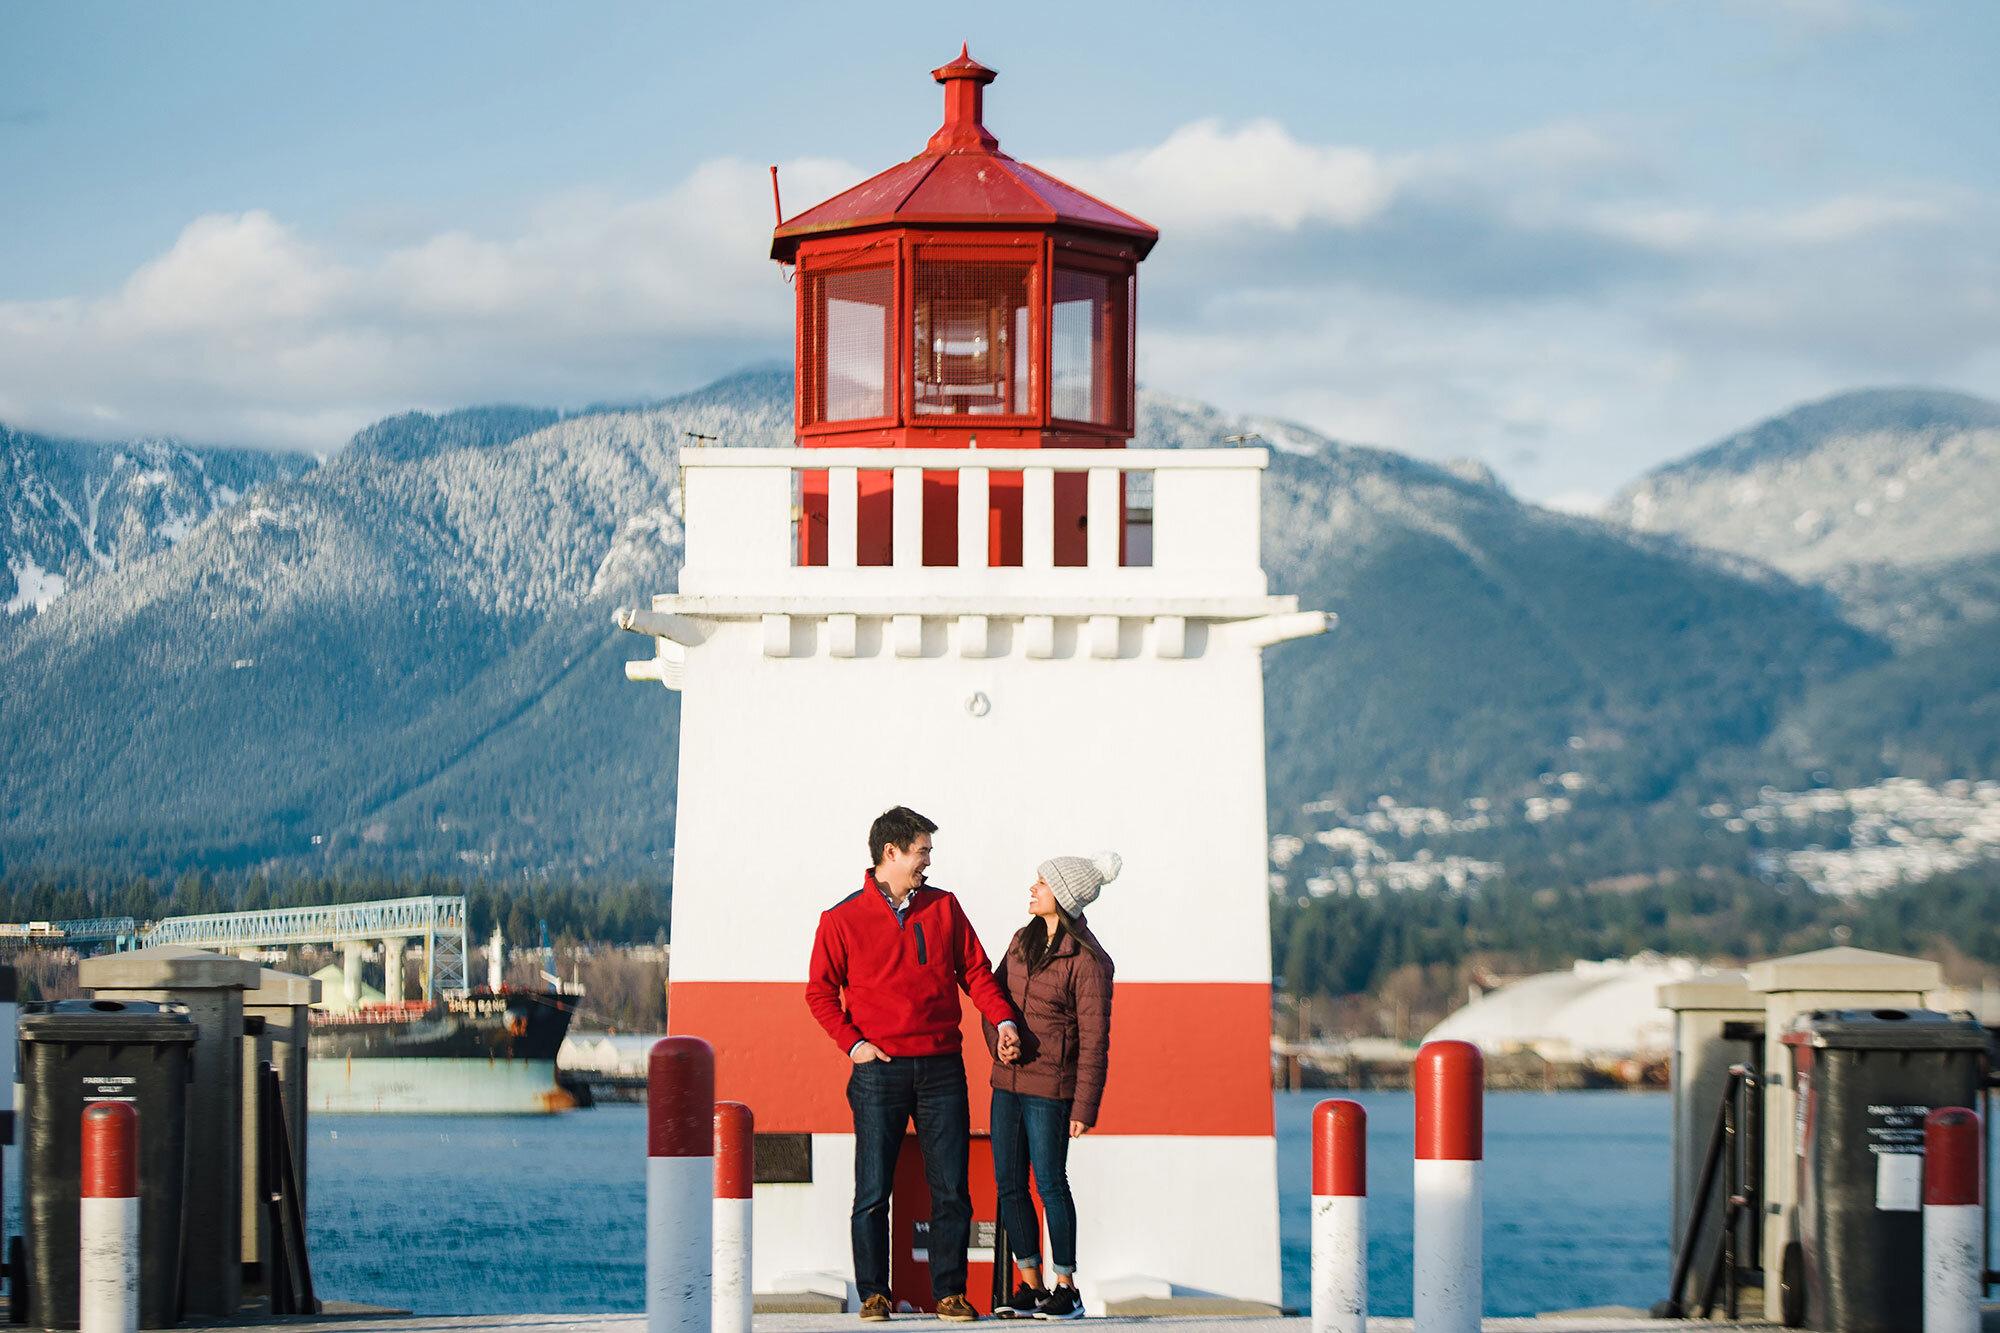 Lighthouse-Stanley-Park-Engagement-Photo-Yaletown-Photography-photo